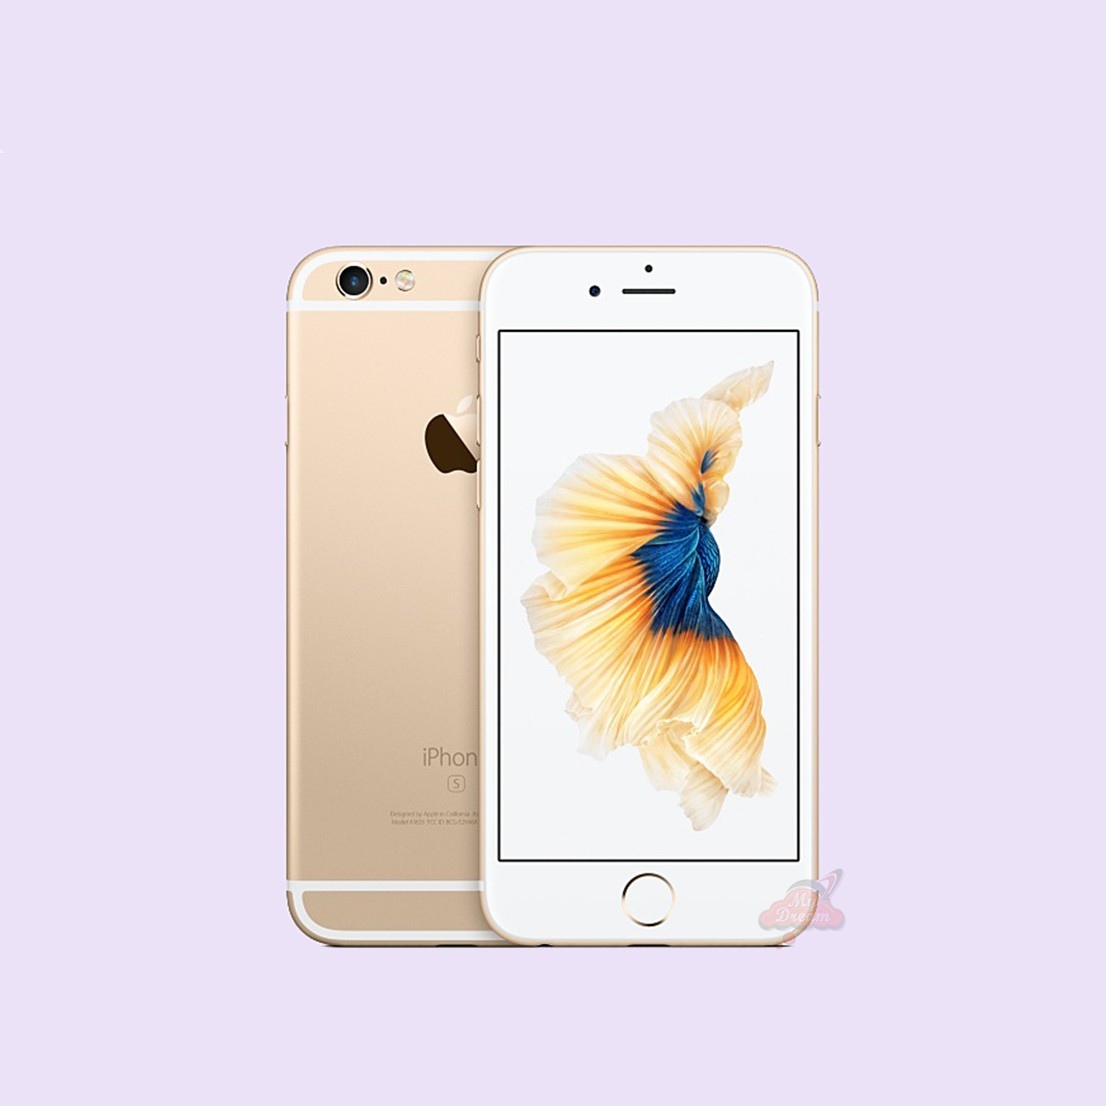 Магазин My Dream!Новые!Оригинал!С гарантией!Apple Iphone 6 32 GB Gold